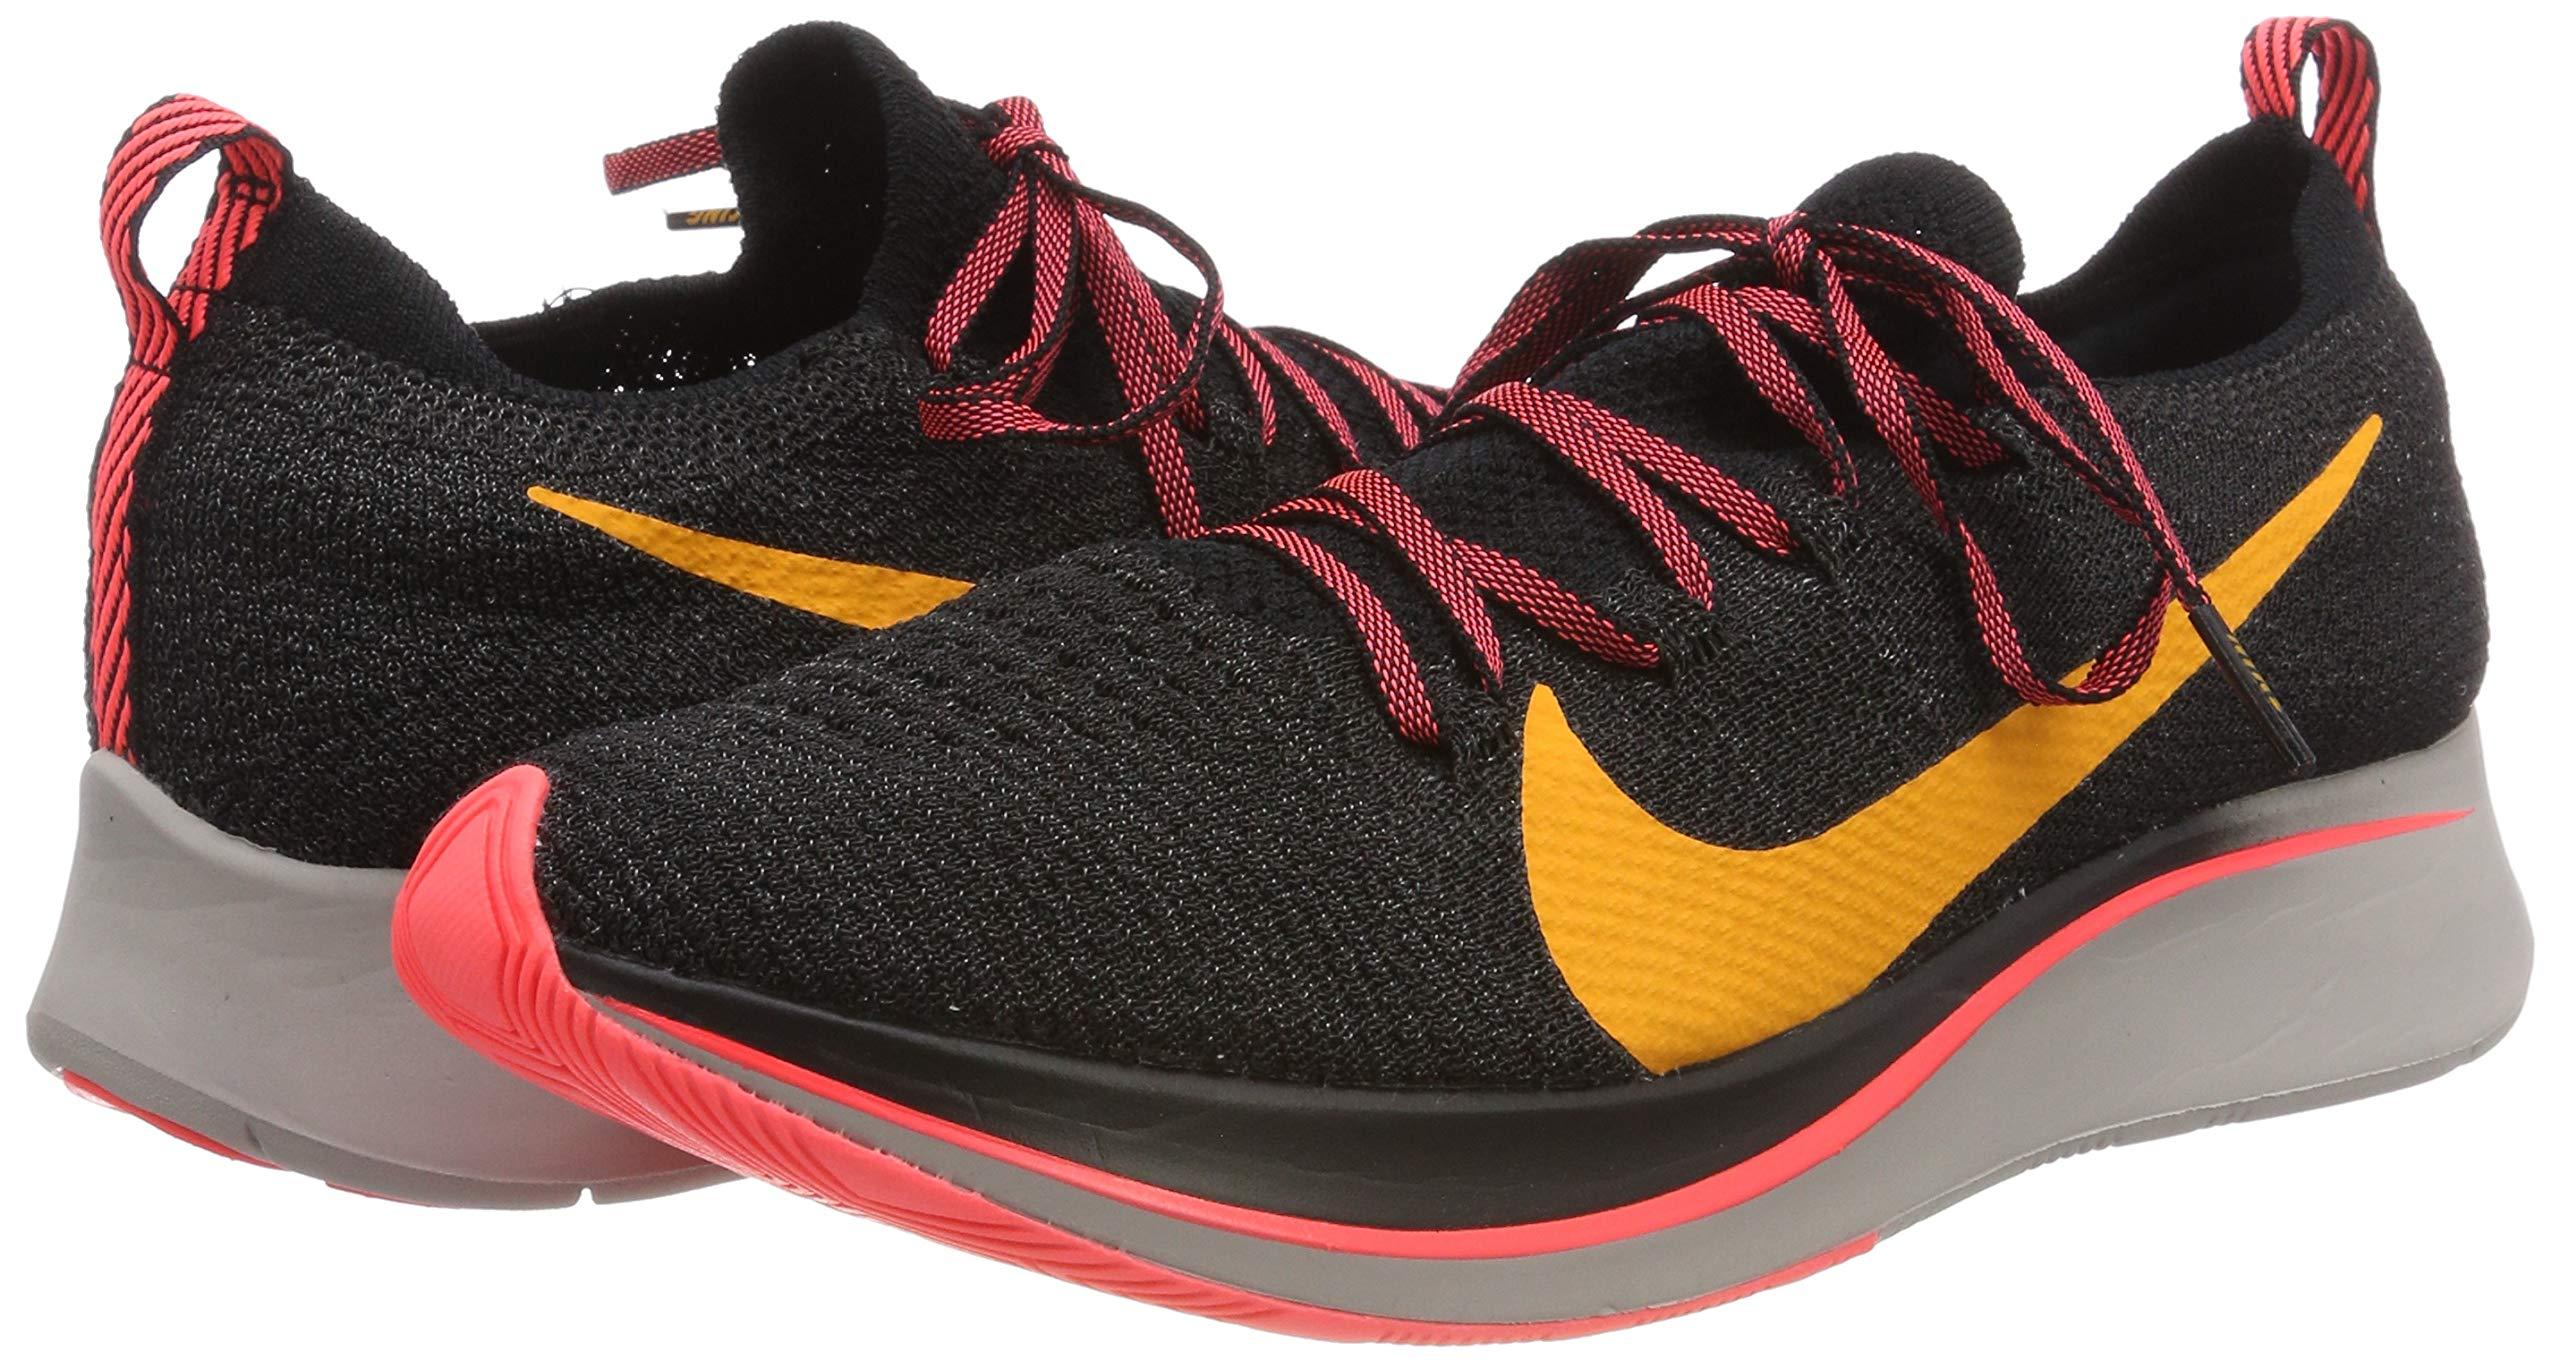 Nike Zoom Fly Flyknit Men's Running Shoe Black/Orange Peel-Flash Crimson Size 8 M US by Nike (Image #5)